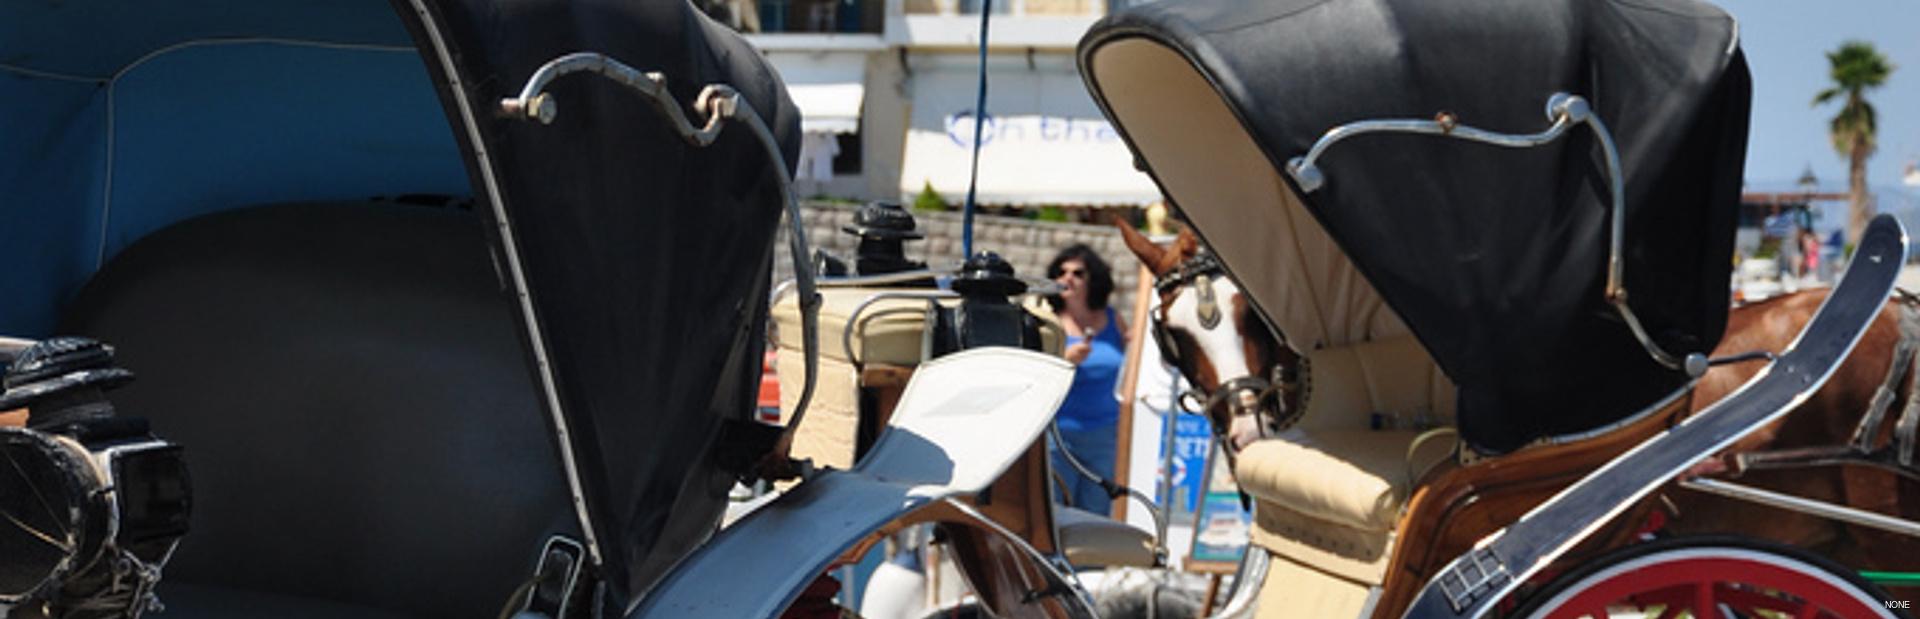 Spetses news photo